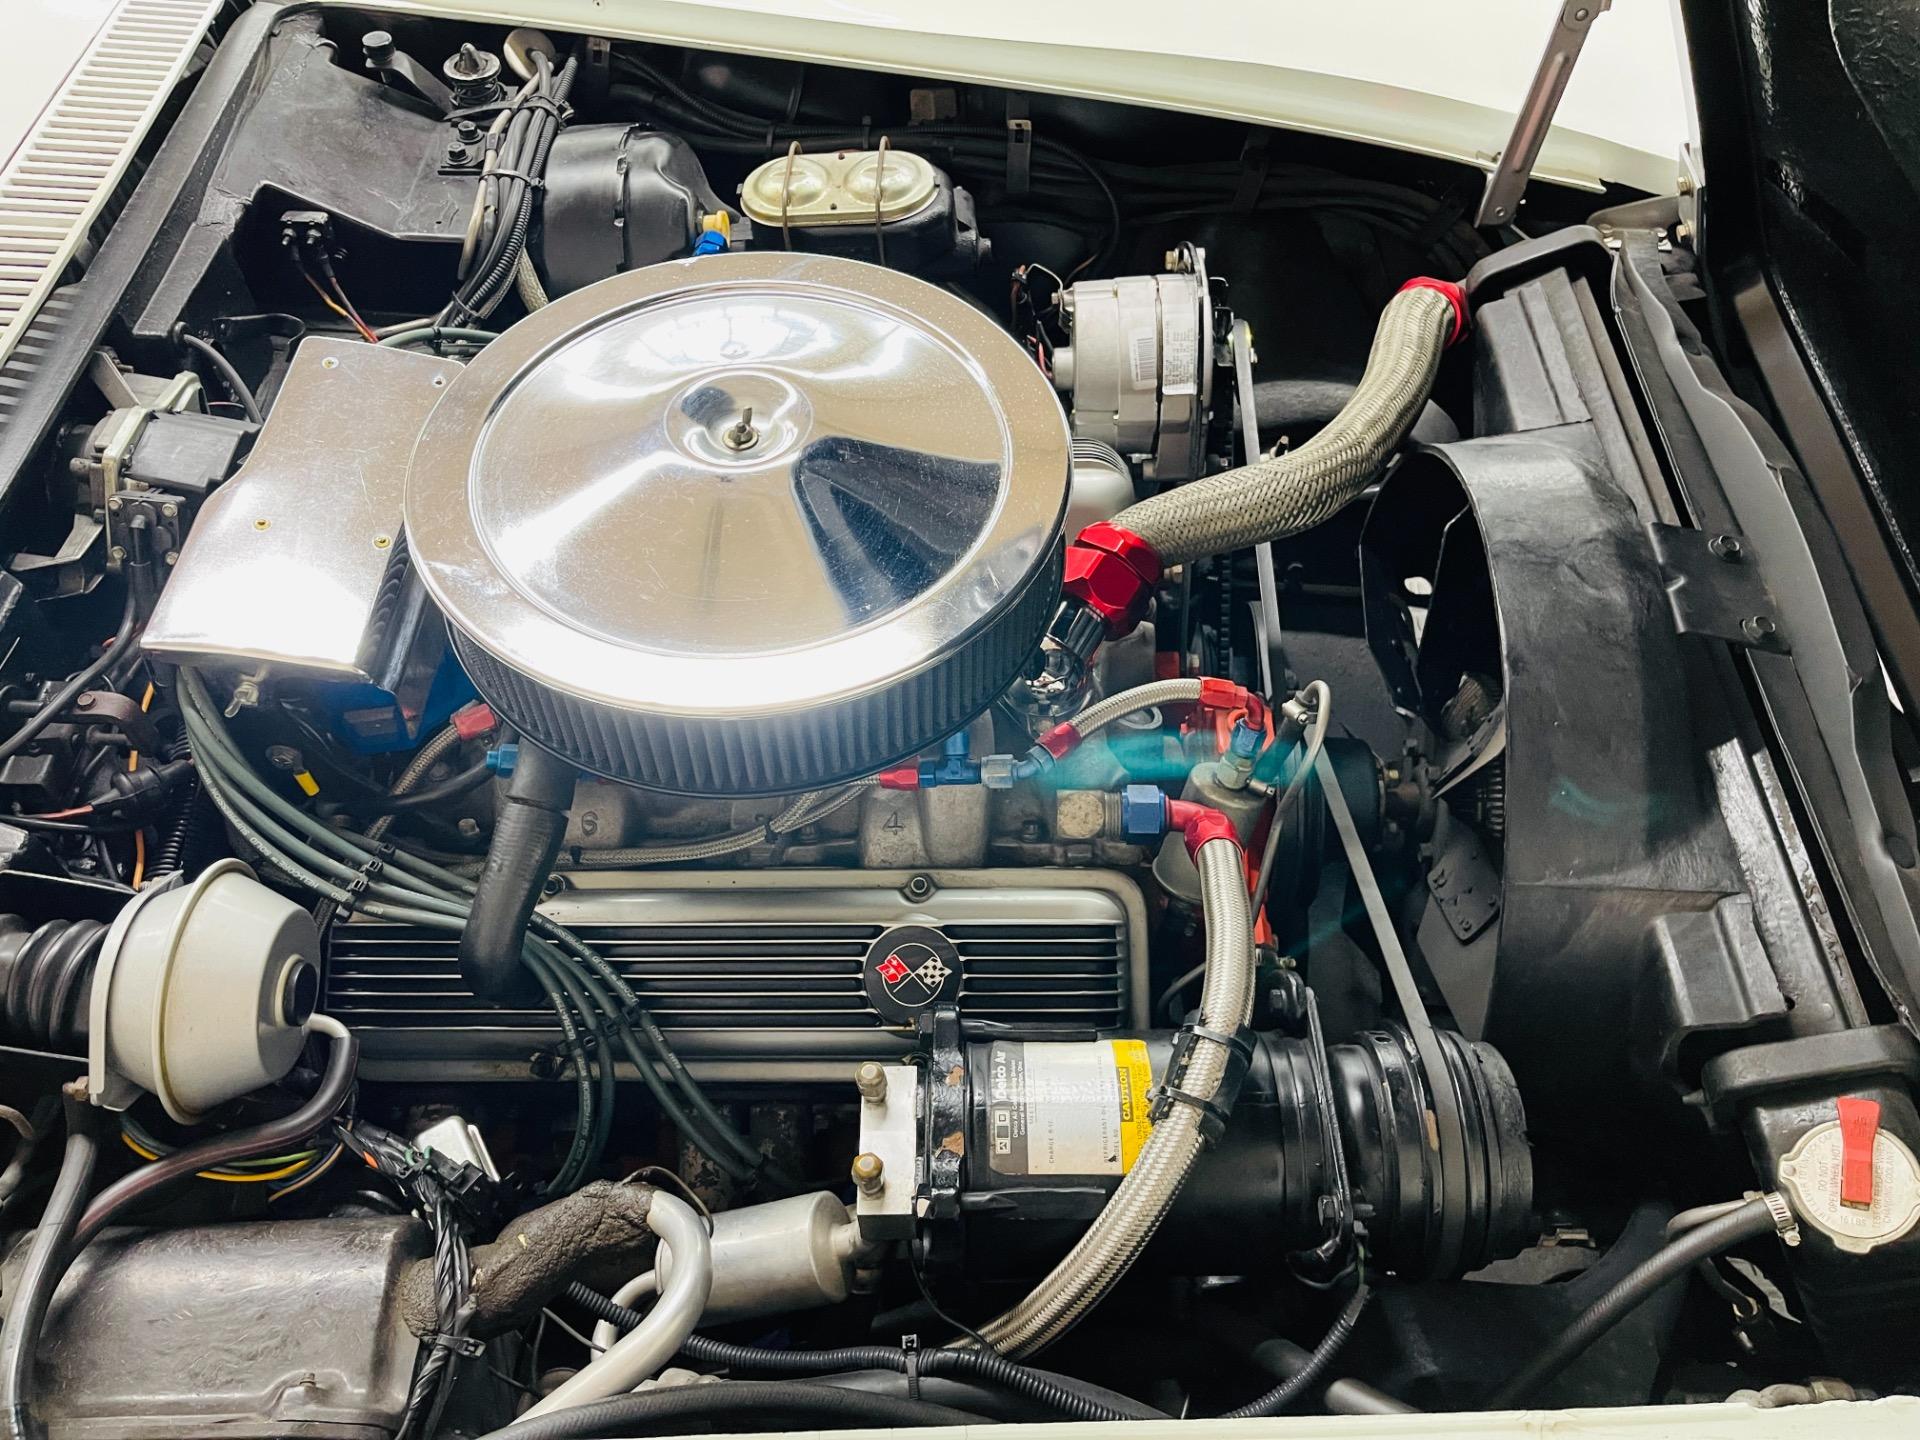 Used 1972 Chevrolet Corvette - CONVERTIBLE - 350 ENGINE - AUTO TRANS - SEE VIDEO - | Mundelein, IL